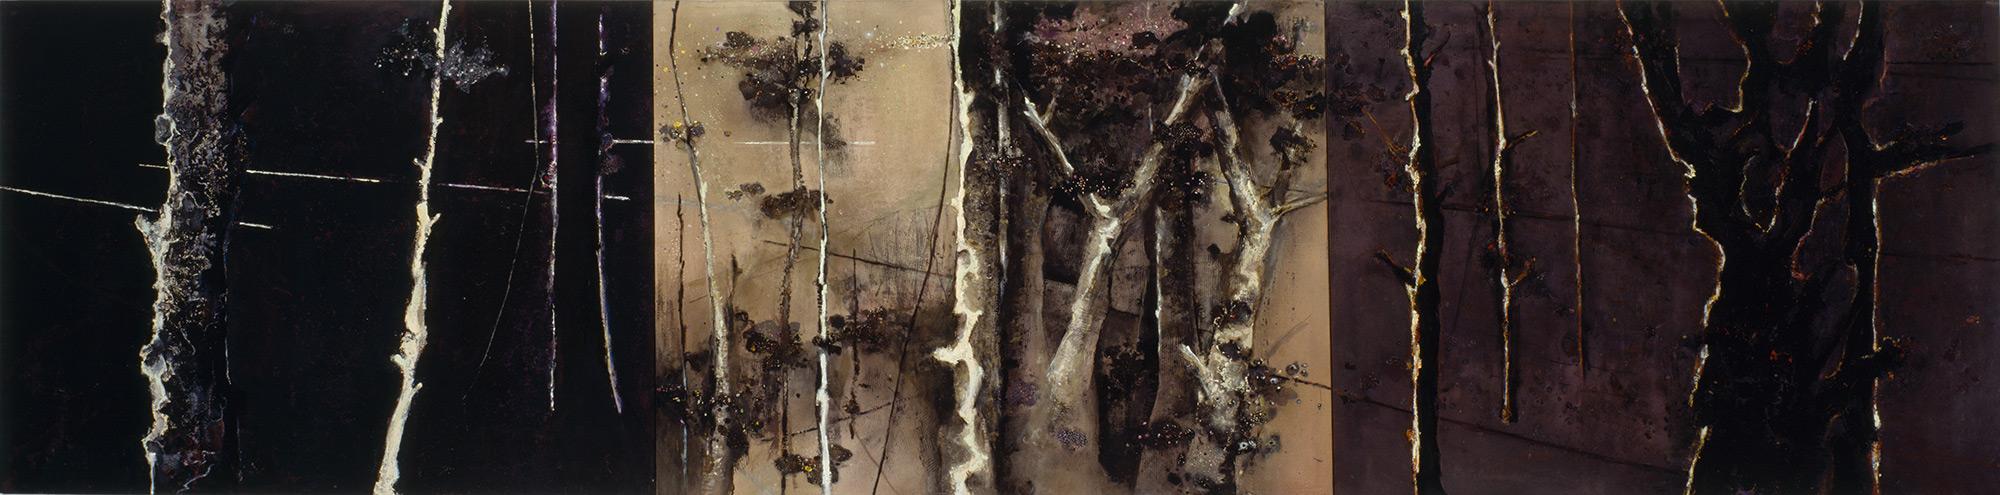 Lyminge Forest III  1983-1999, 168 x 685 cm